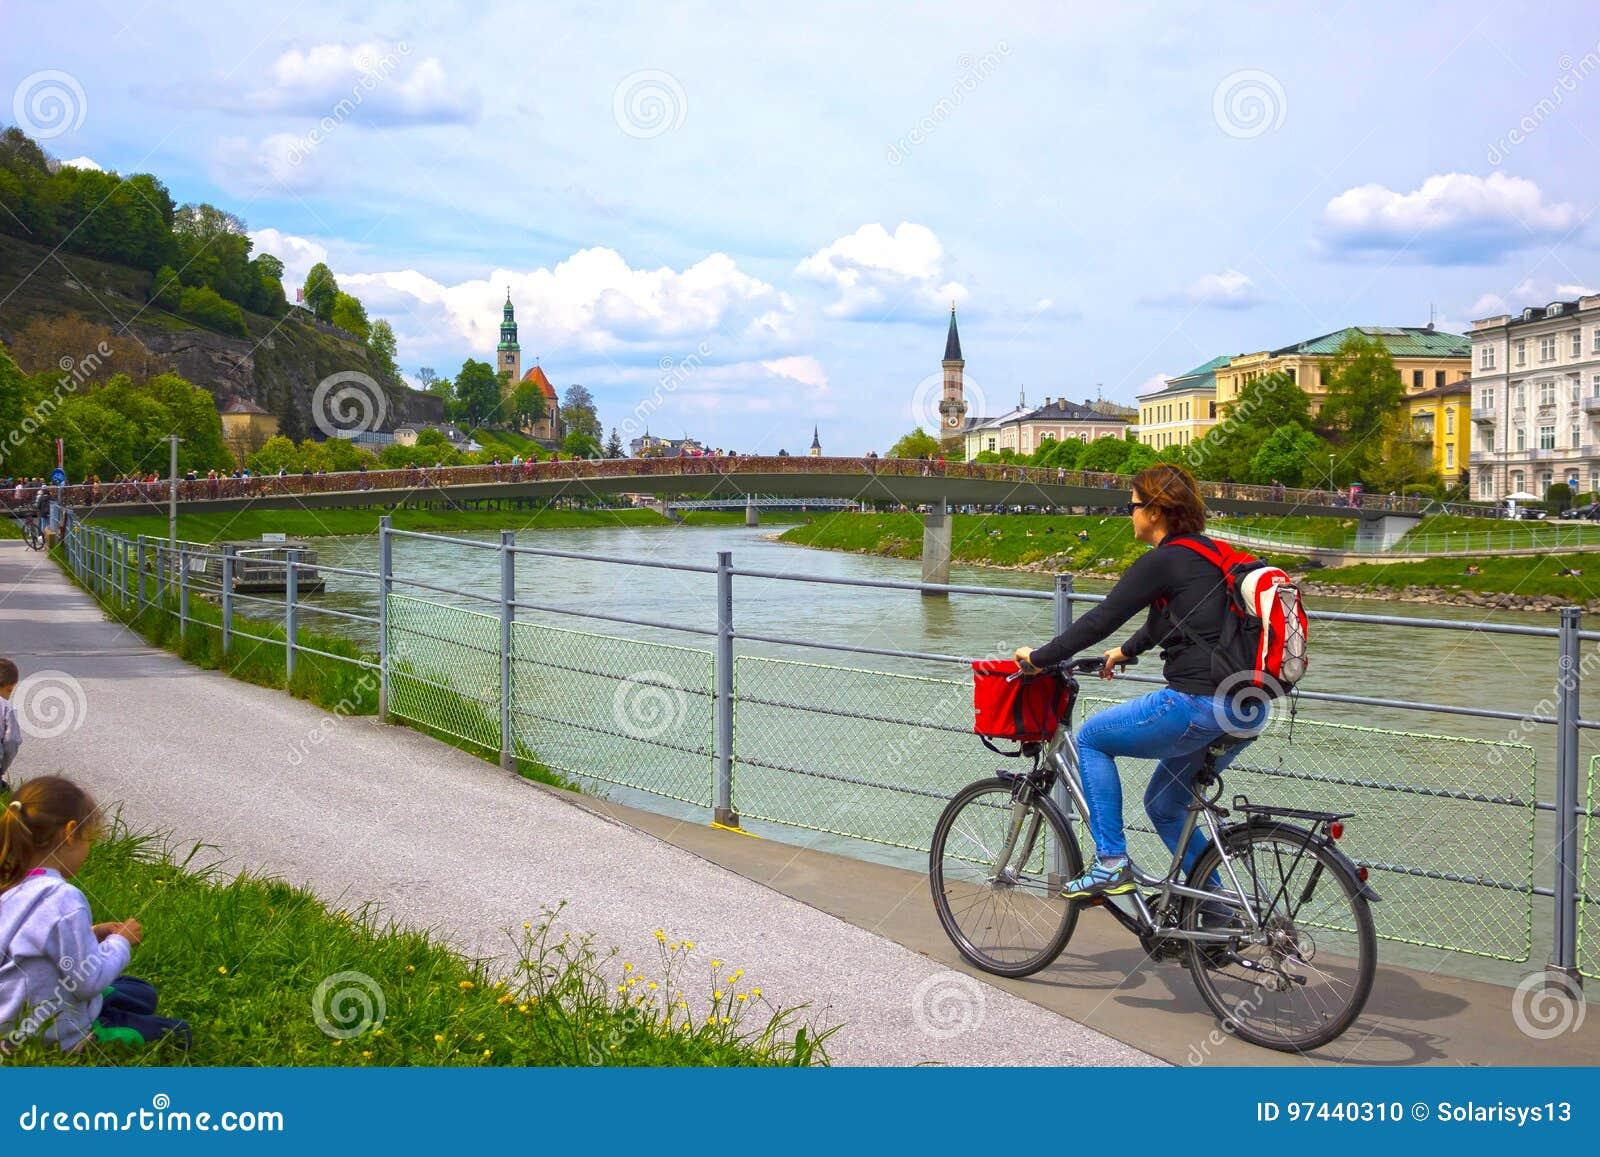 Salzburg, Austria - May 01, 2017: Cyclist on the embankment in Salzburg